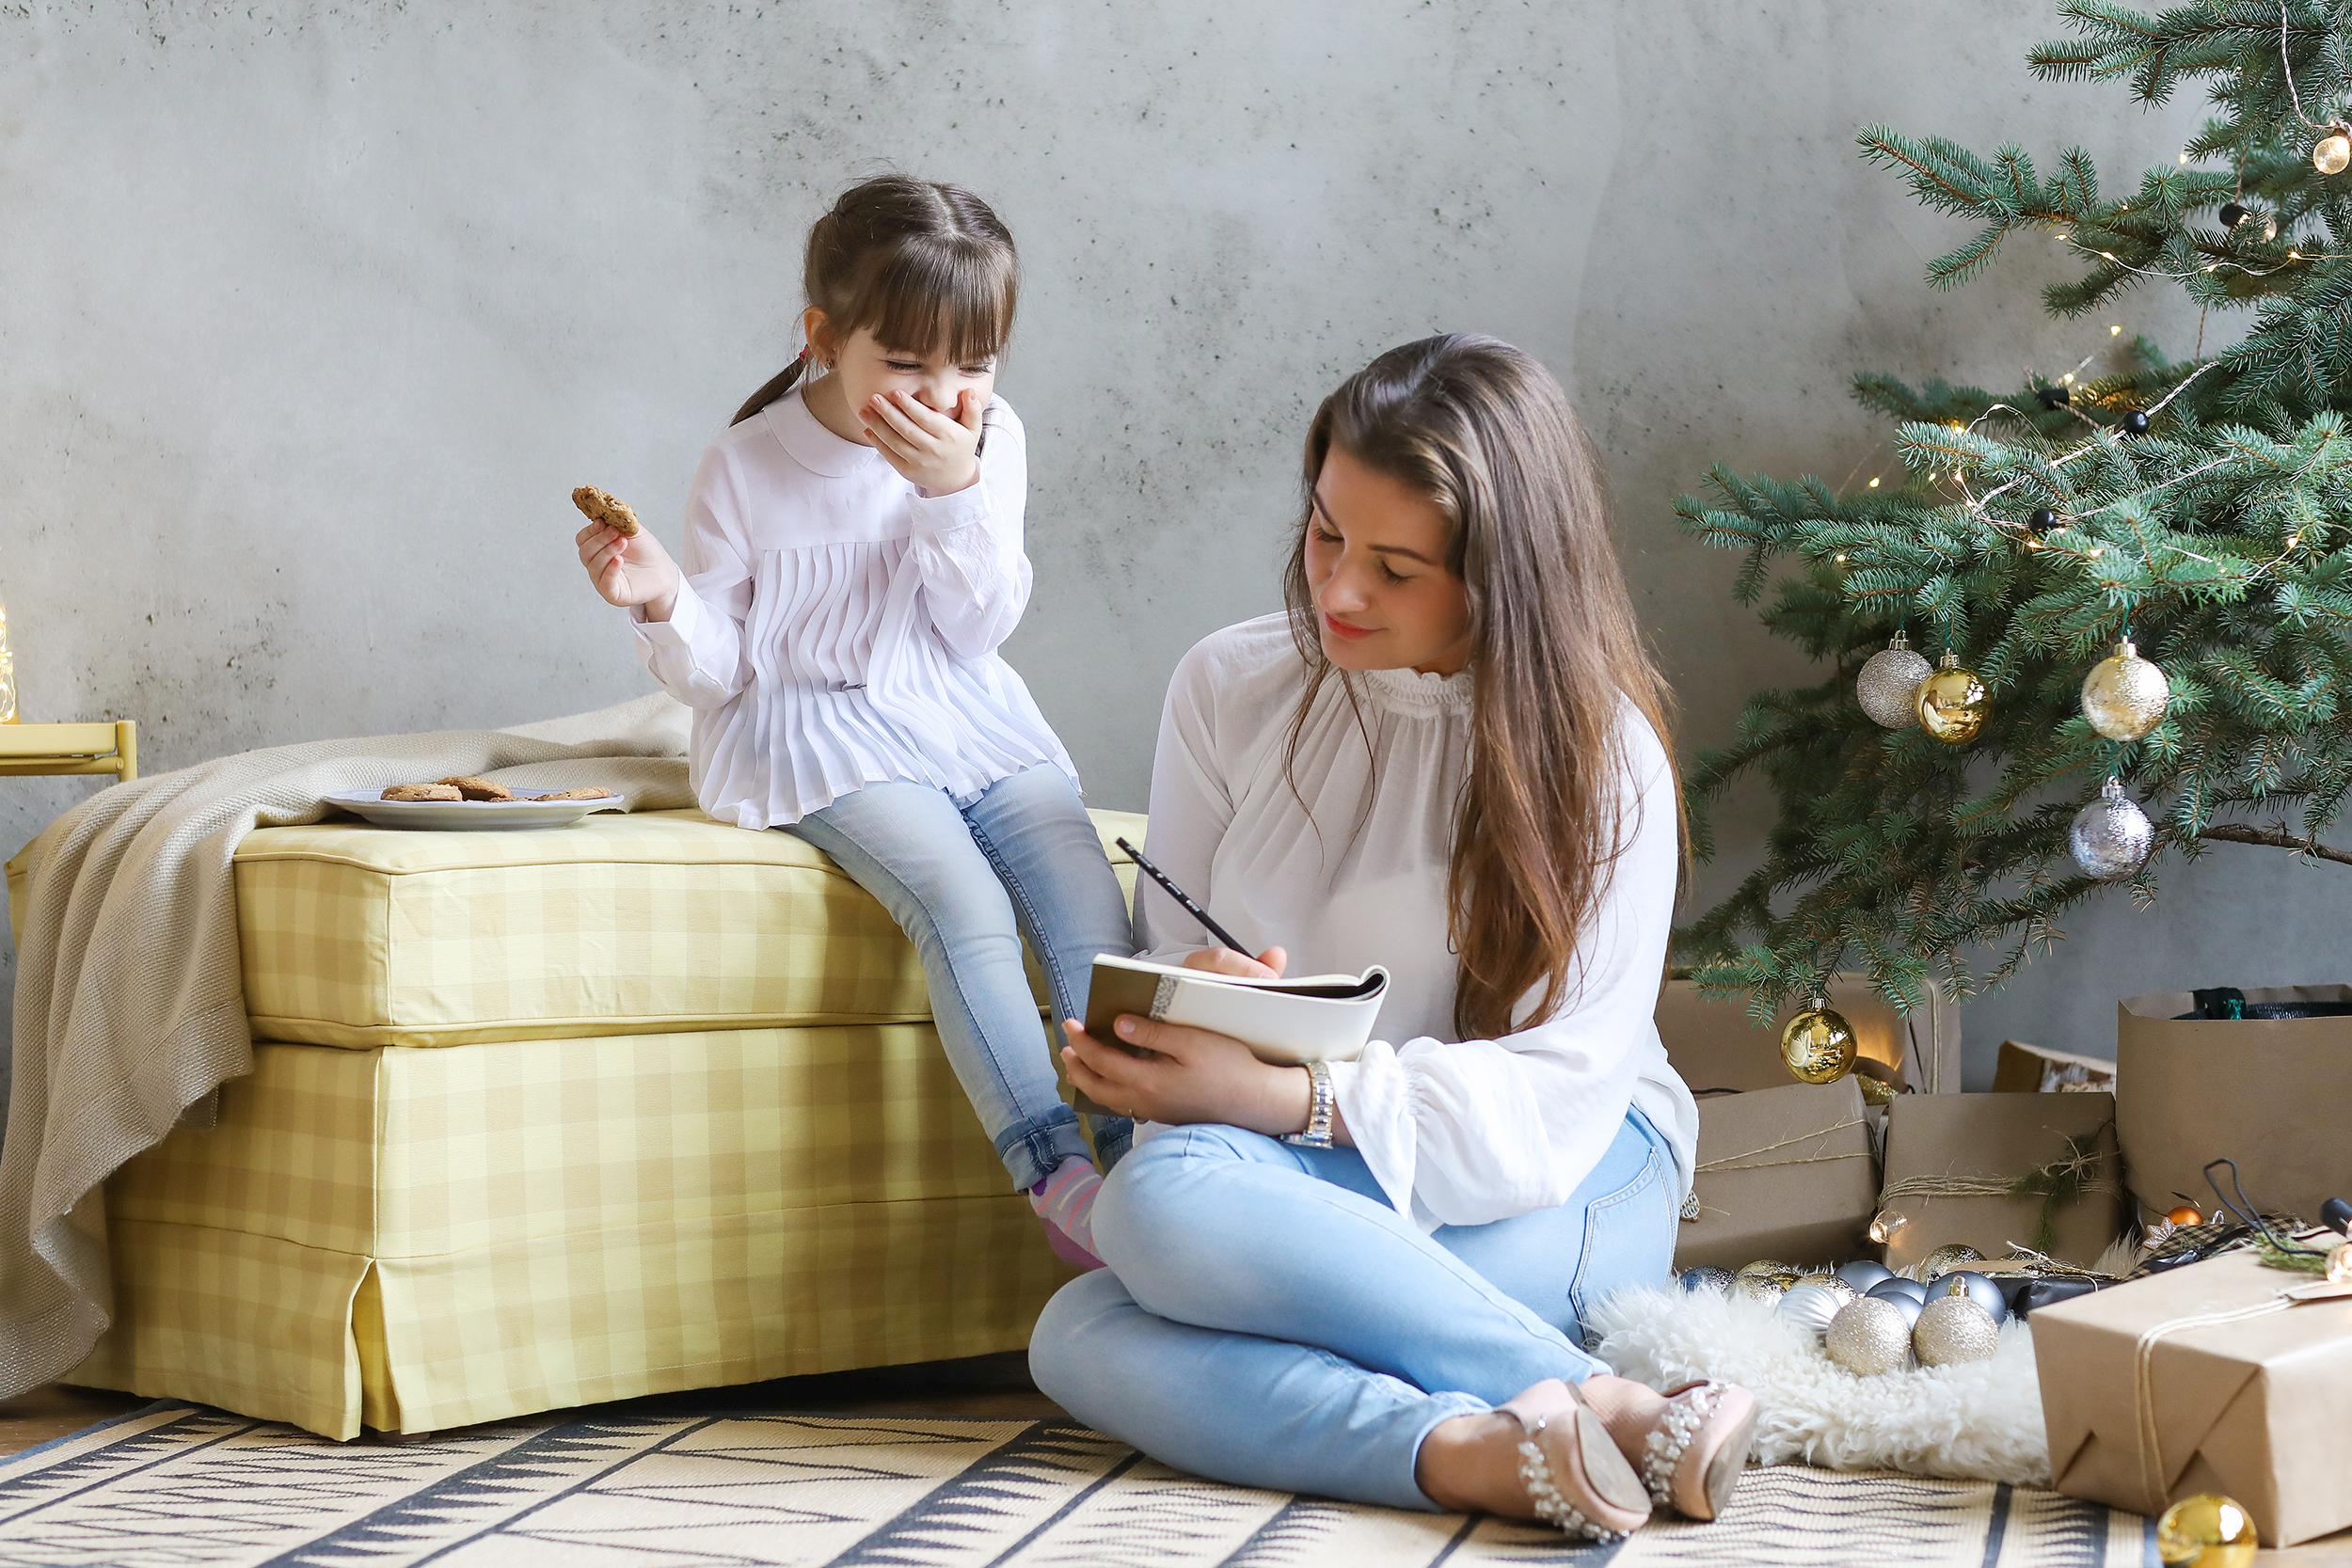 family-having-fun-christmas-day